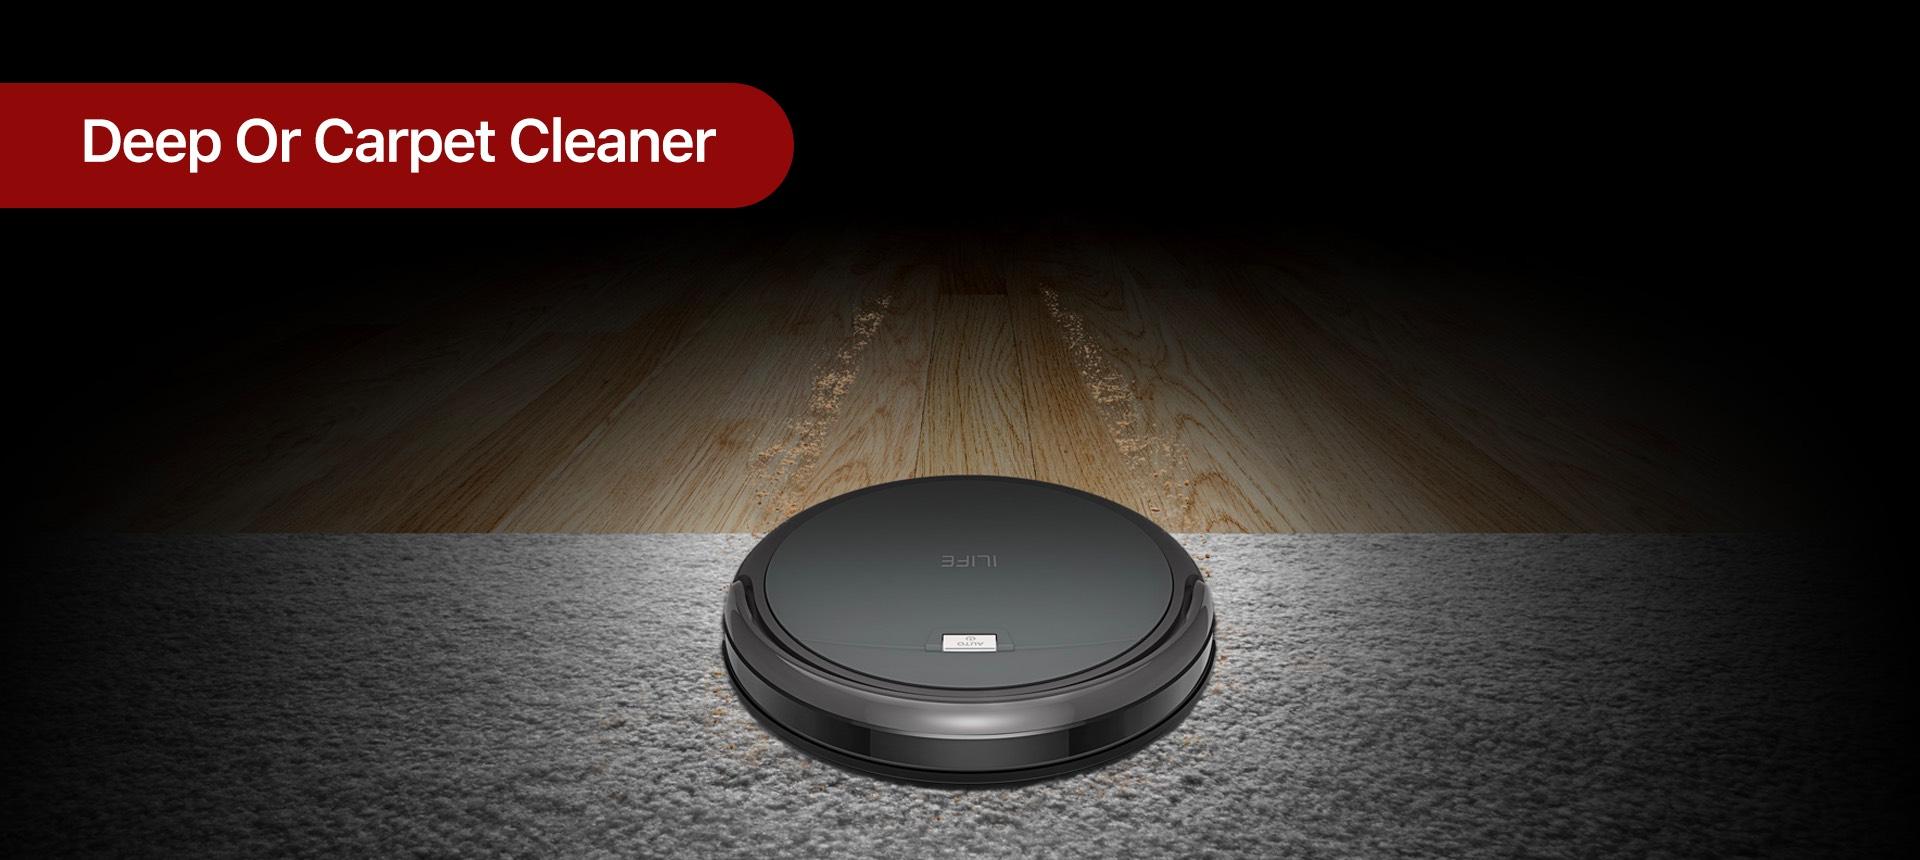 Deep or Carpet Cleaner